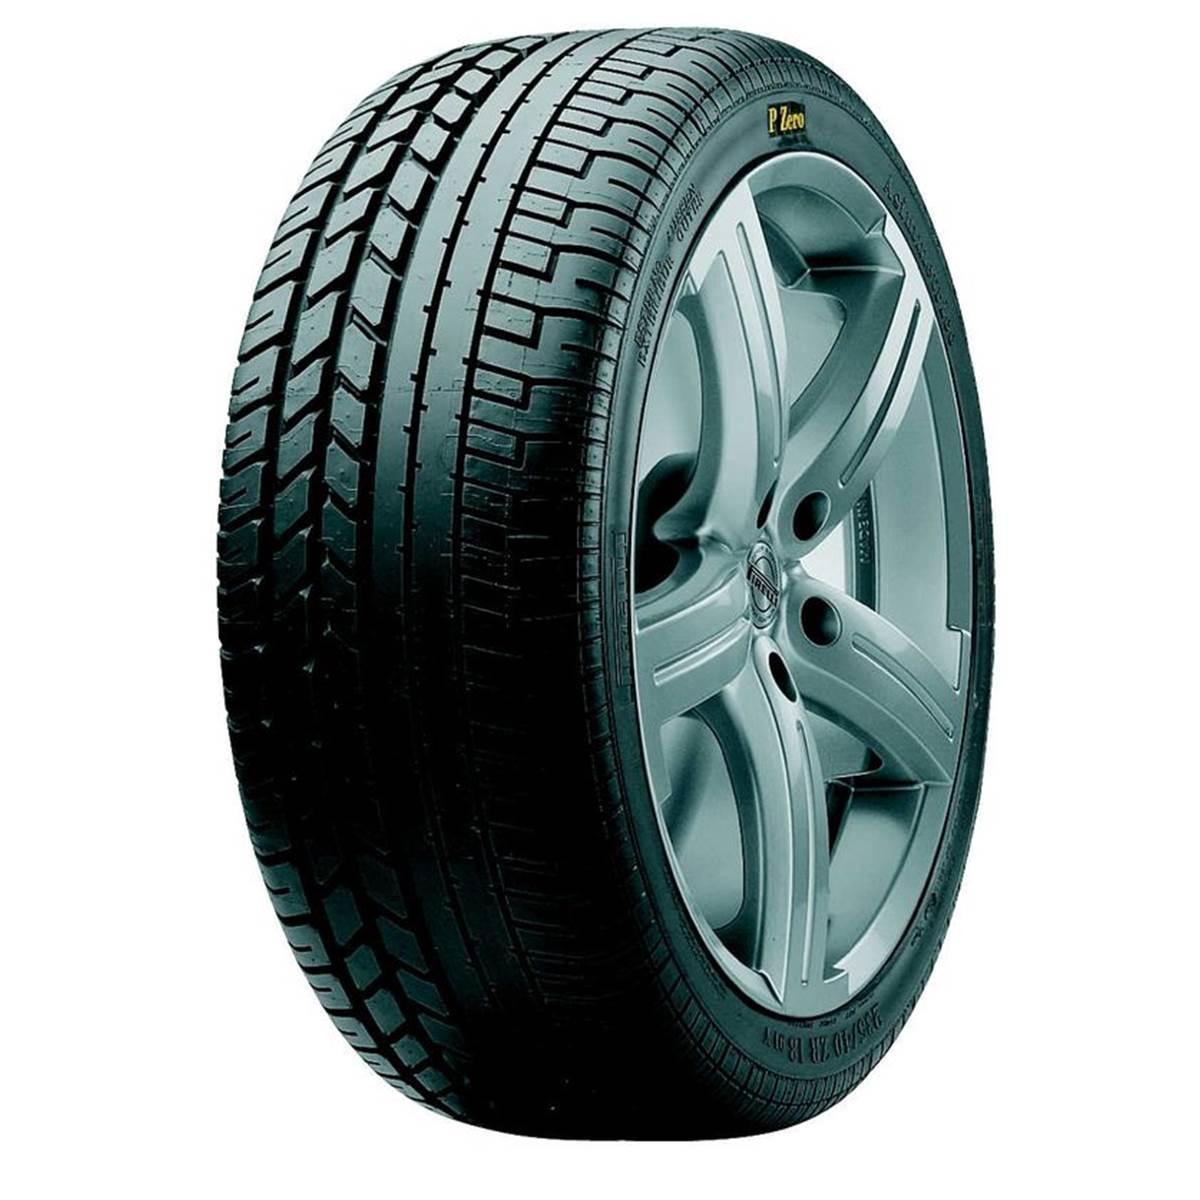 Pneu Pirelli 335/35R17 106Y Pzero Asimmetrico